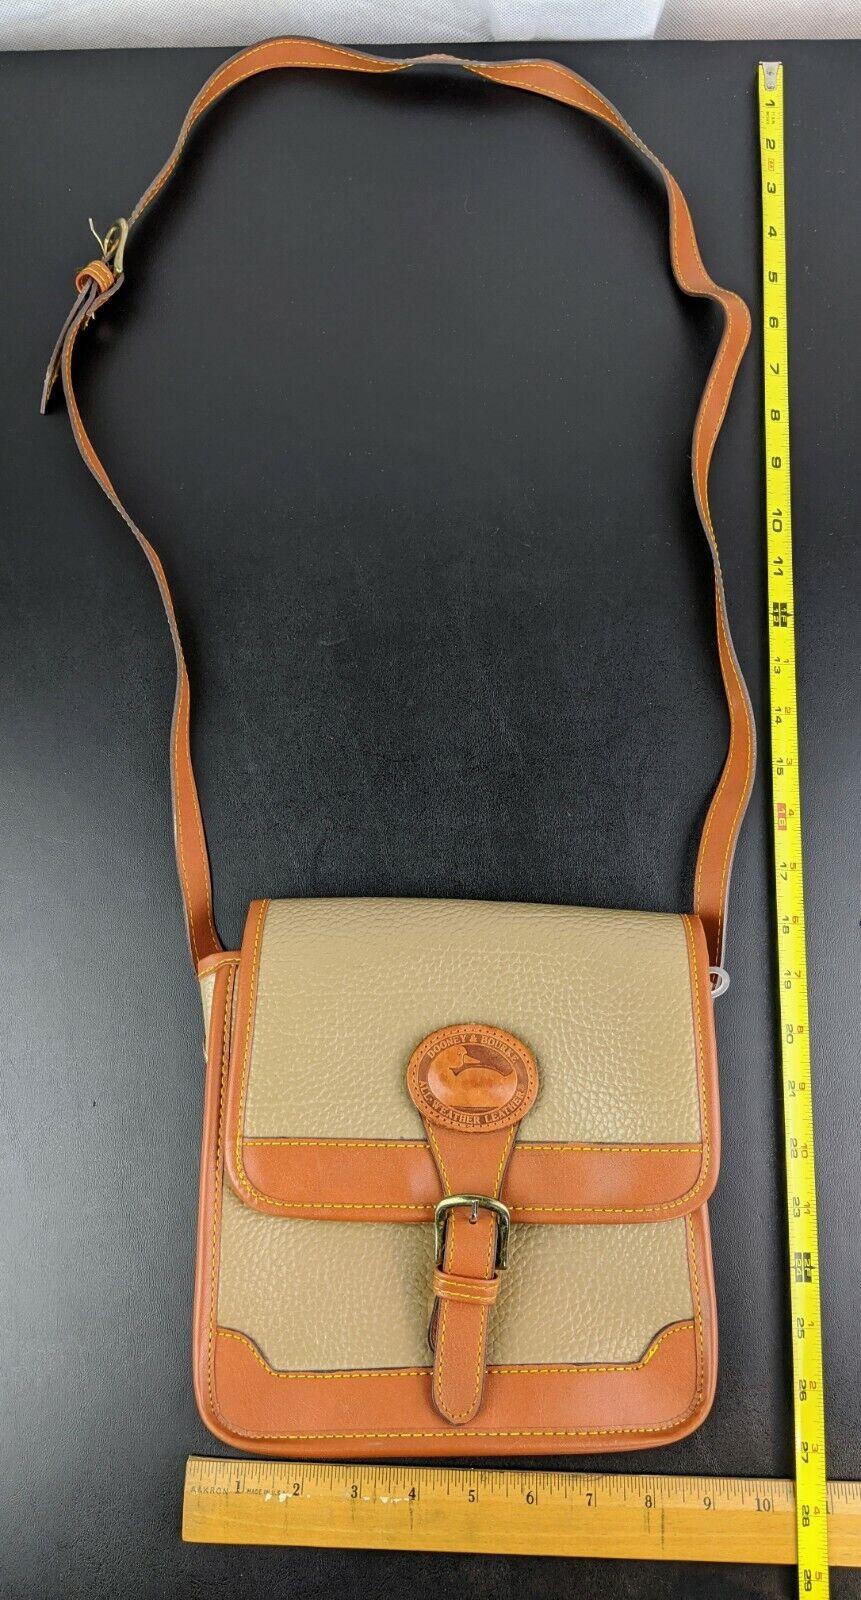 Dooney & Bourke Tan Brown Small Purse Handbag Tra… - image 12